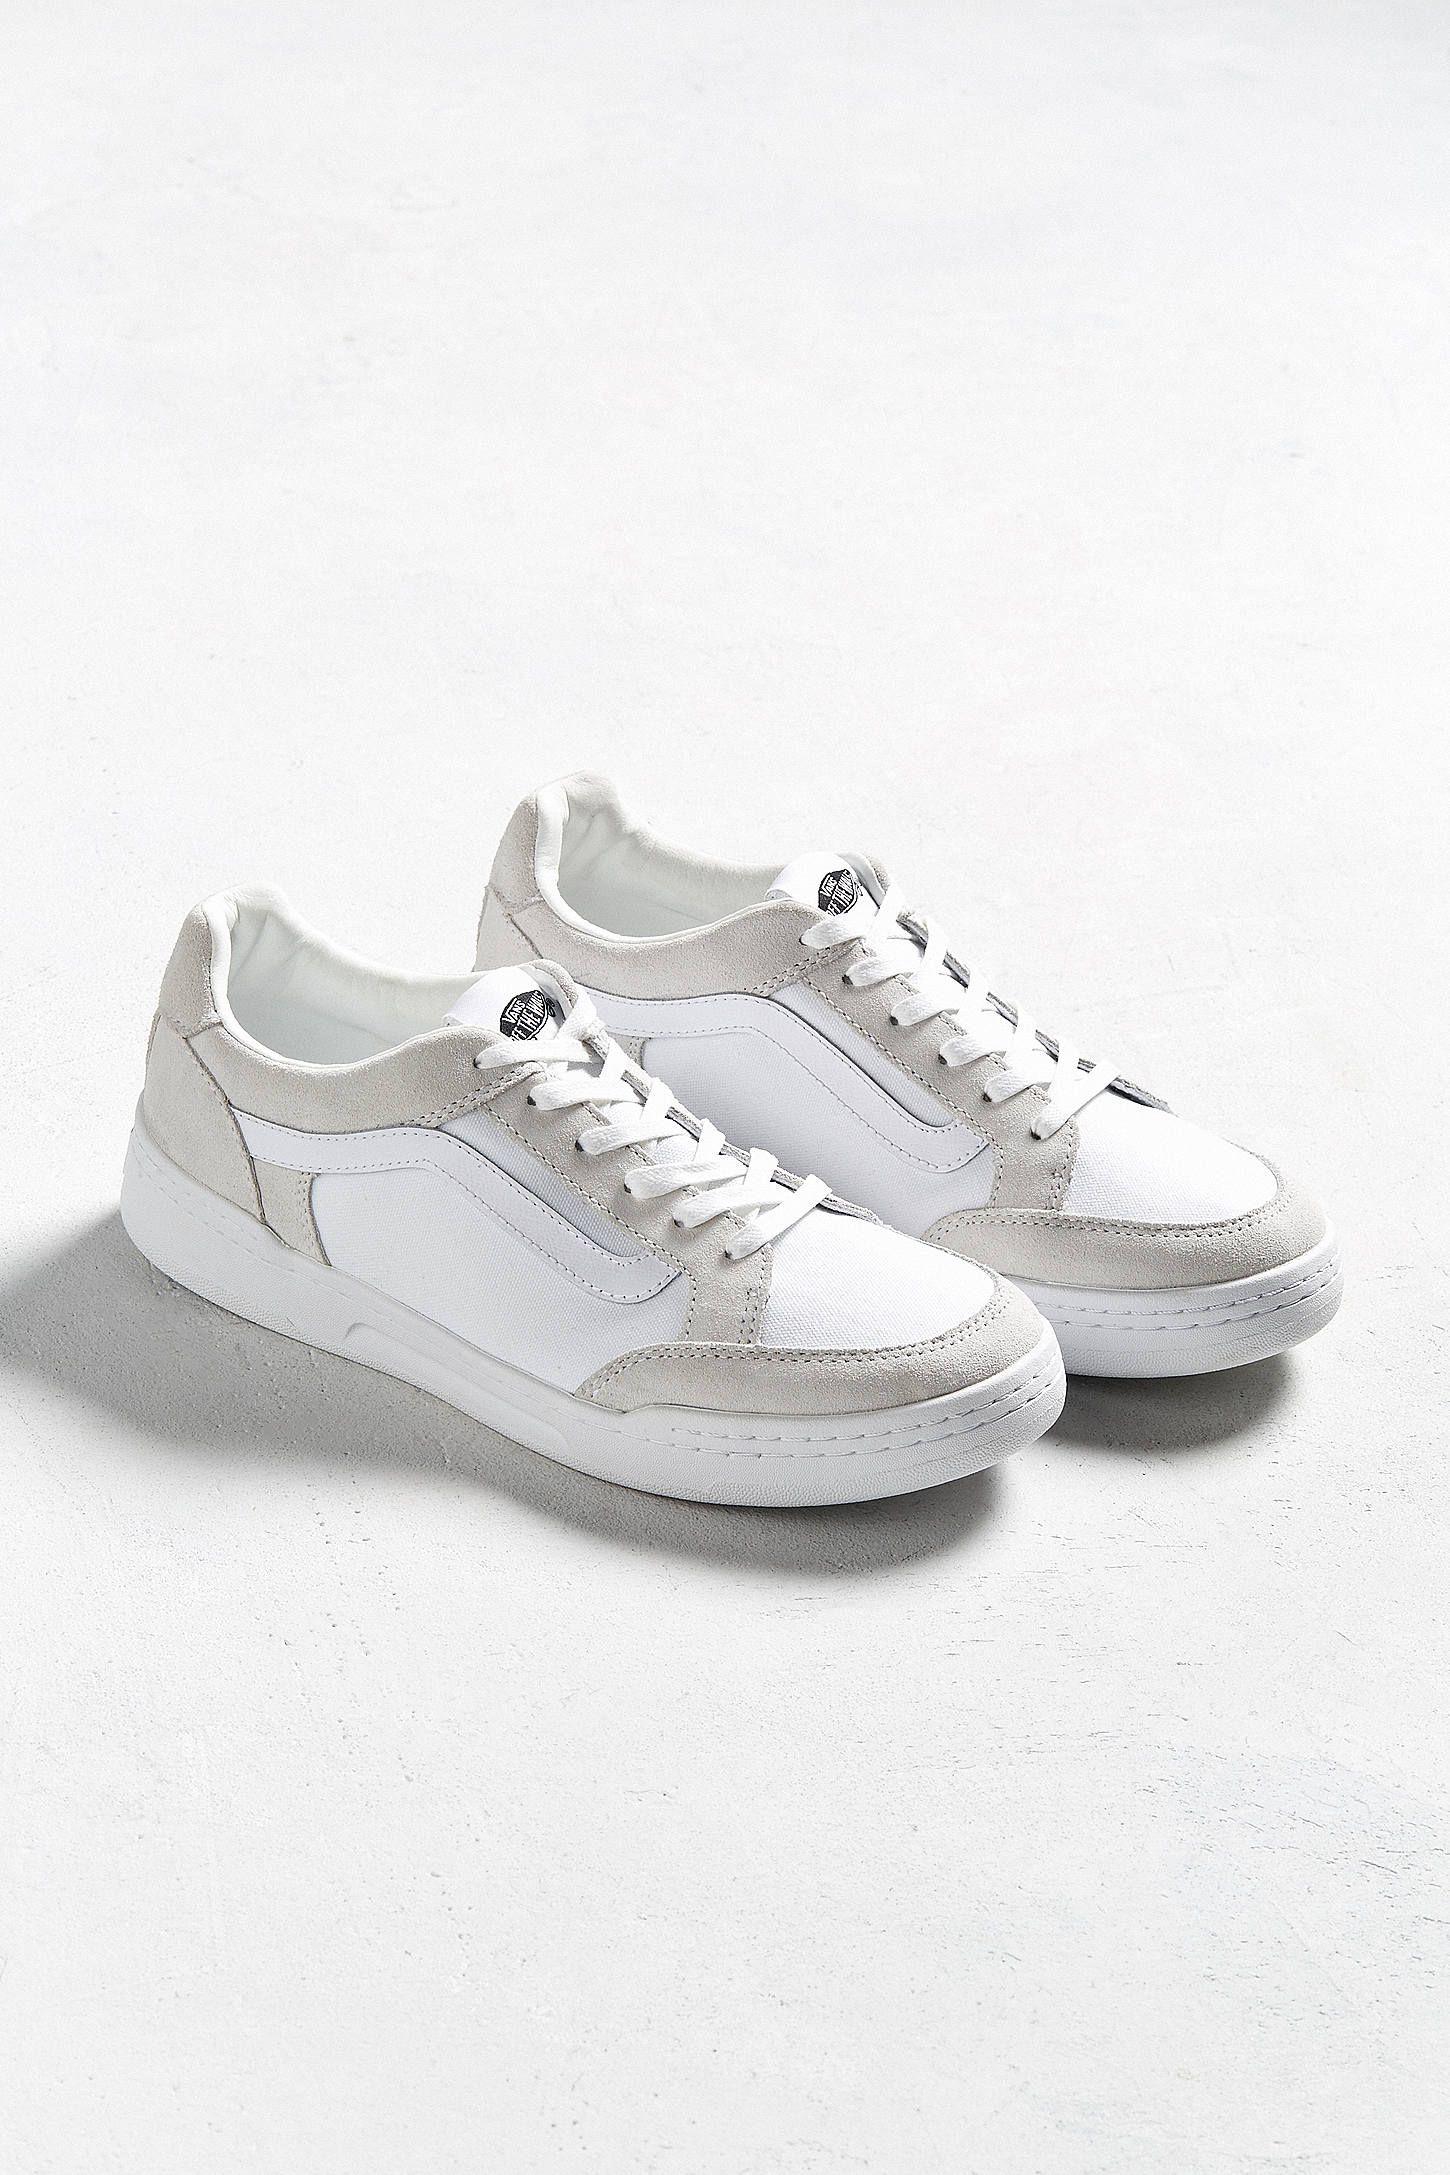 5cd63d7e2e Slide View  2  Vans Highland Sneaker Van Shoes